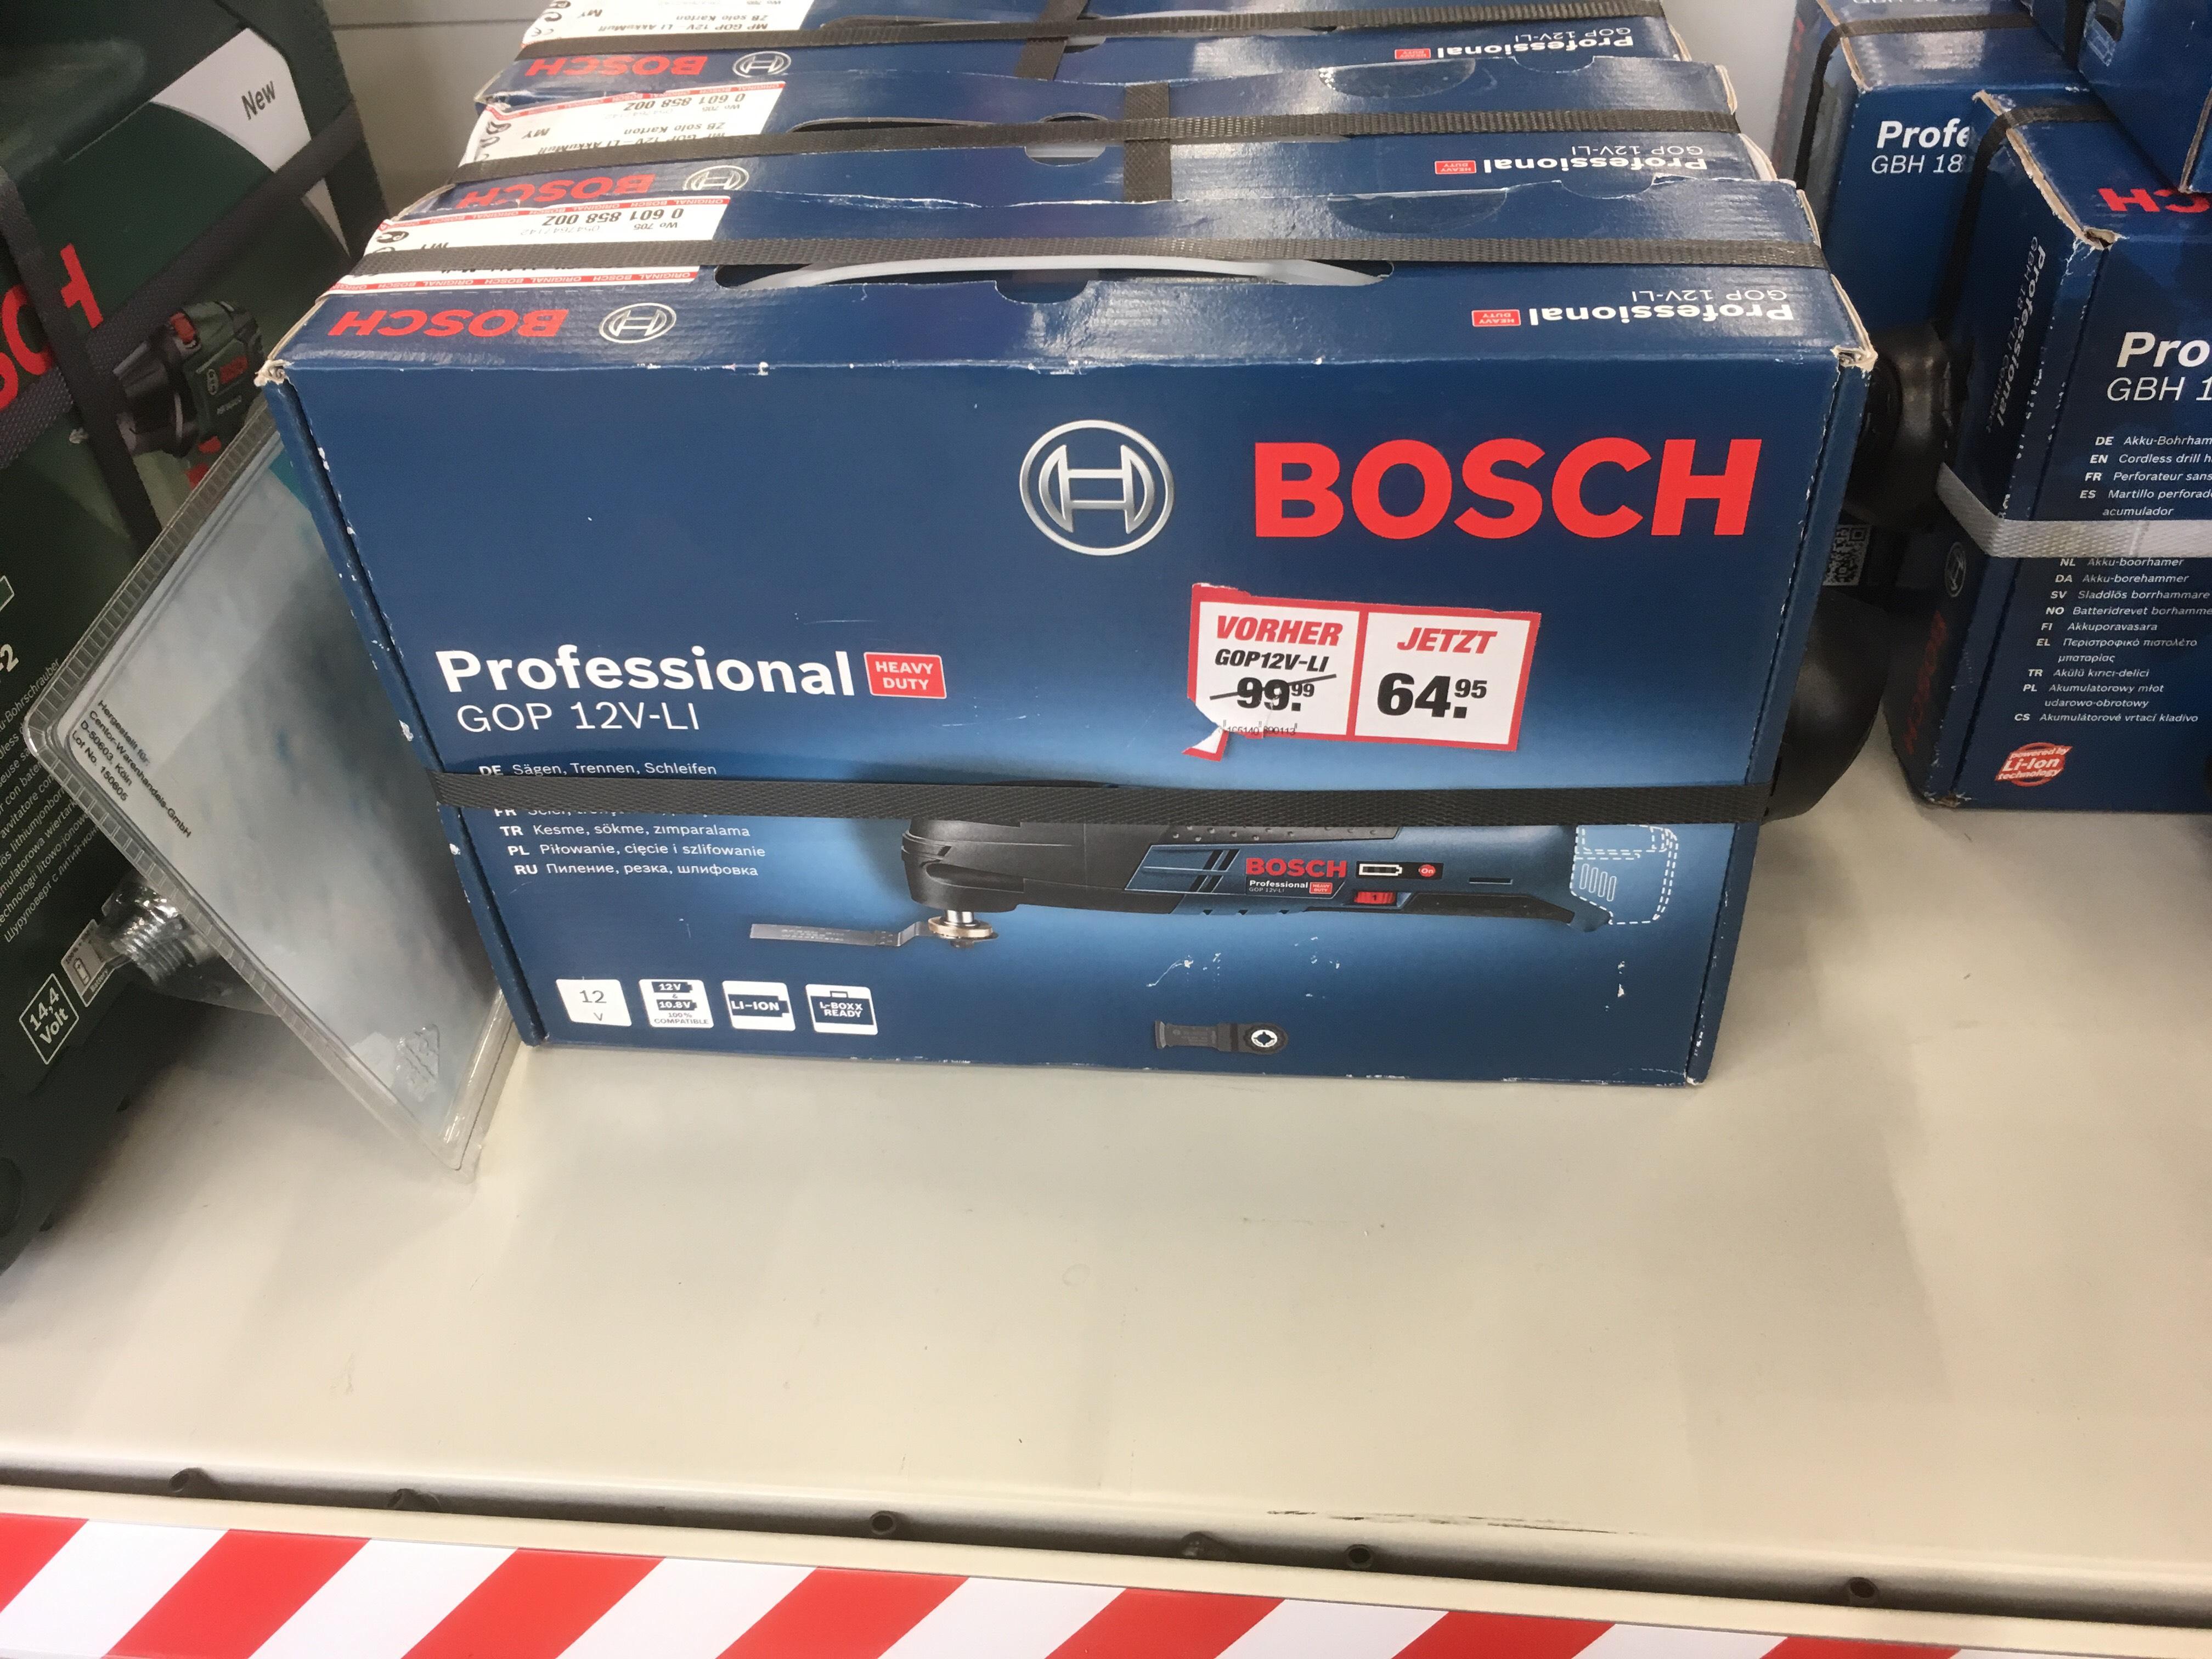 [Lokal Toom Lemgo] Bosch Multitool GOP 12V-Li ohne Akku